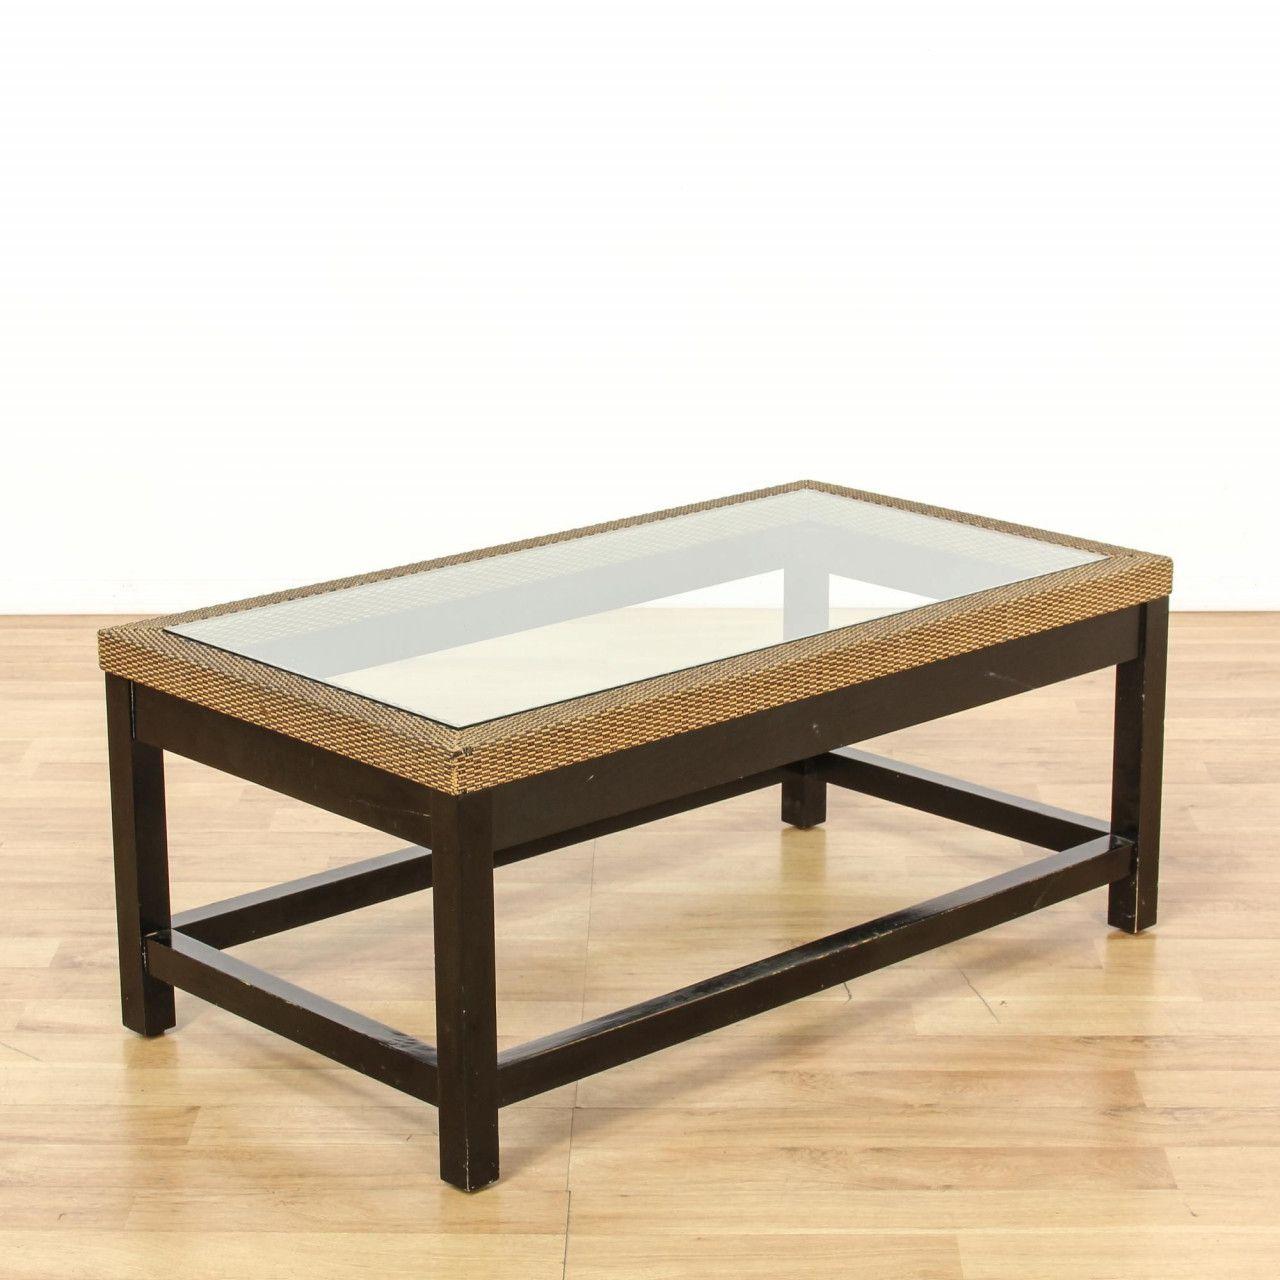 99 Luxury Black Solid Wood Coffee Table 2020 Solid Wood Coffee Table Coffee Table Clear Coffee Table [ 1280 x 1280 Pixel ]